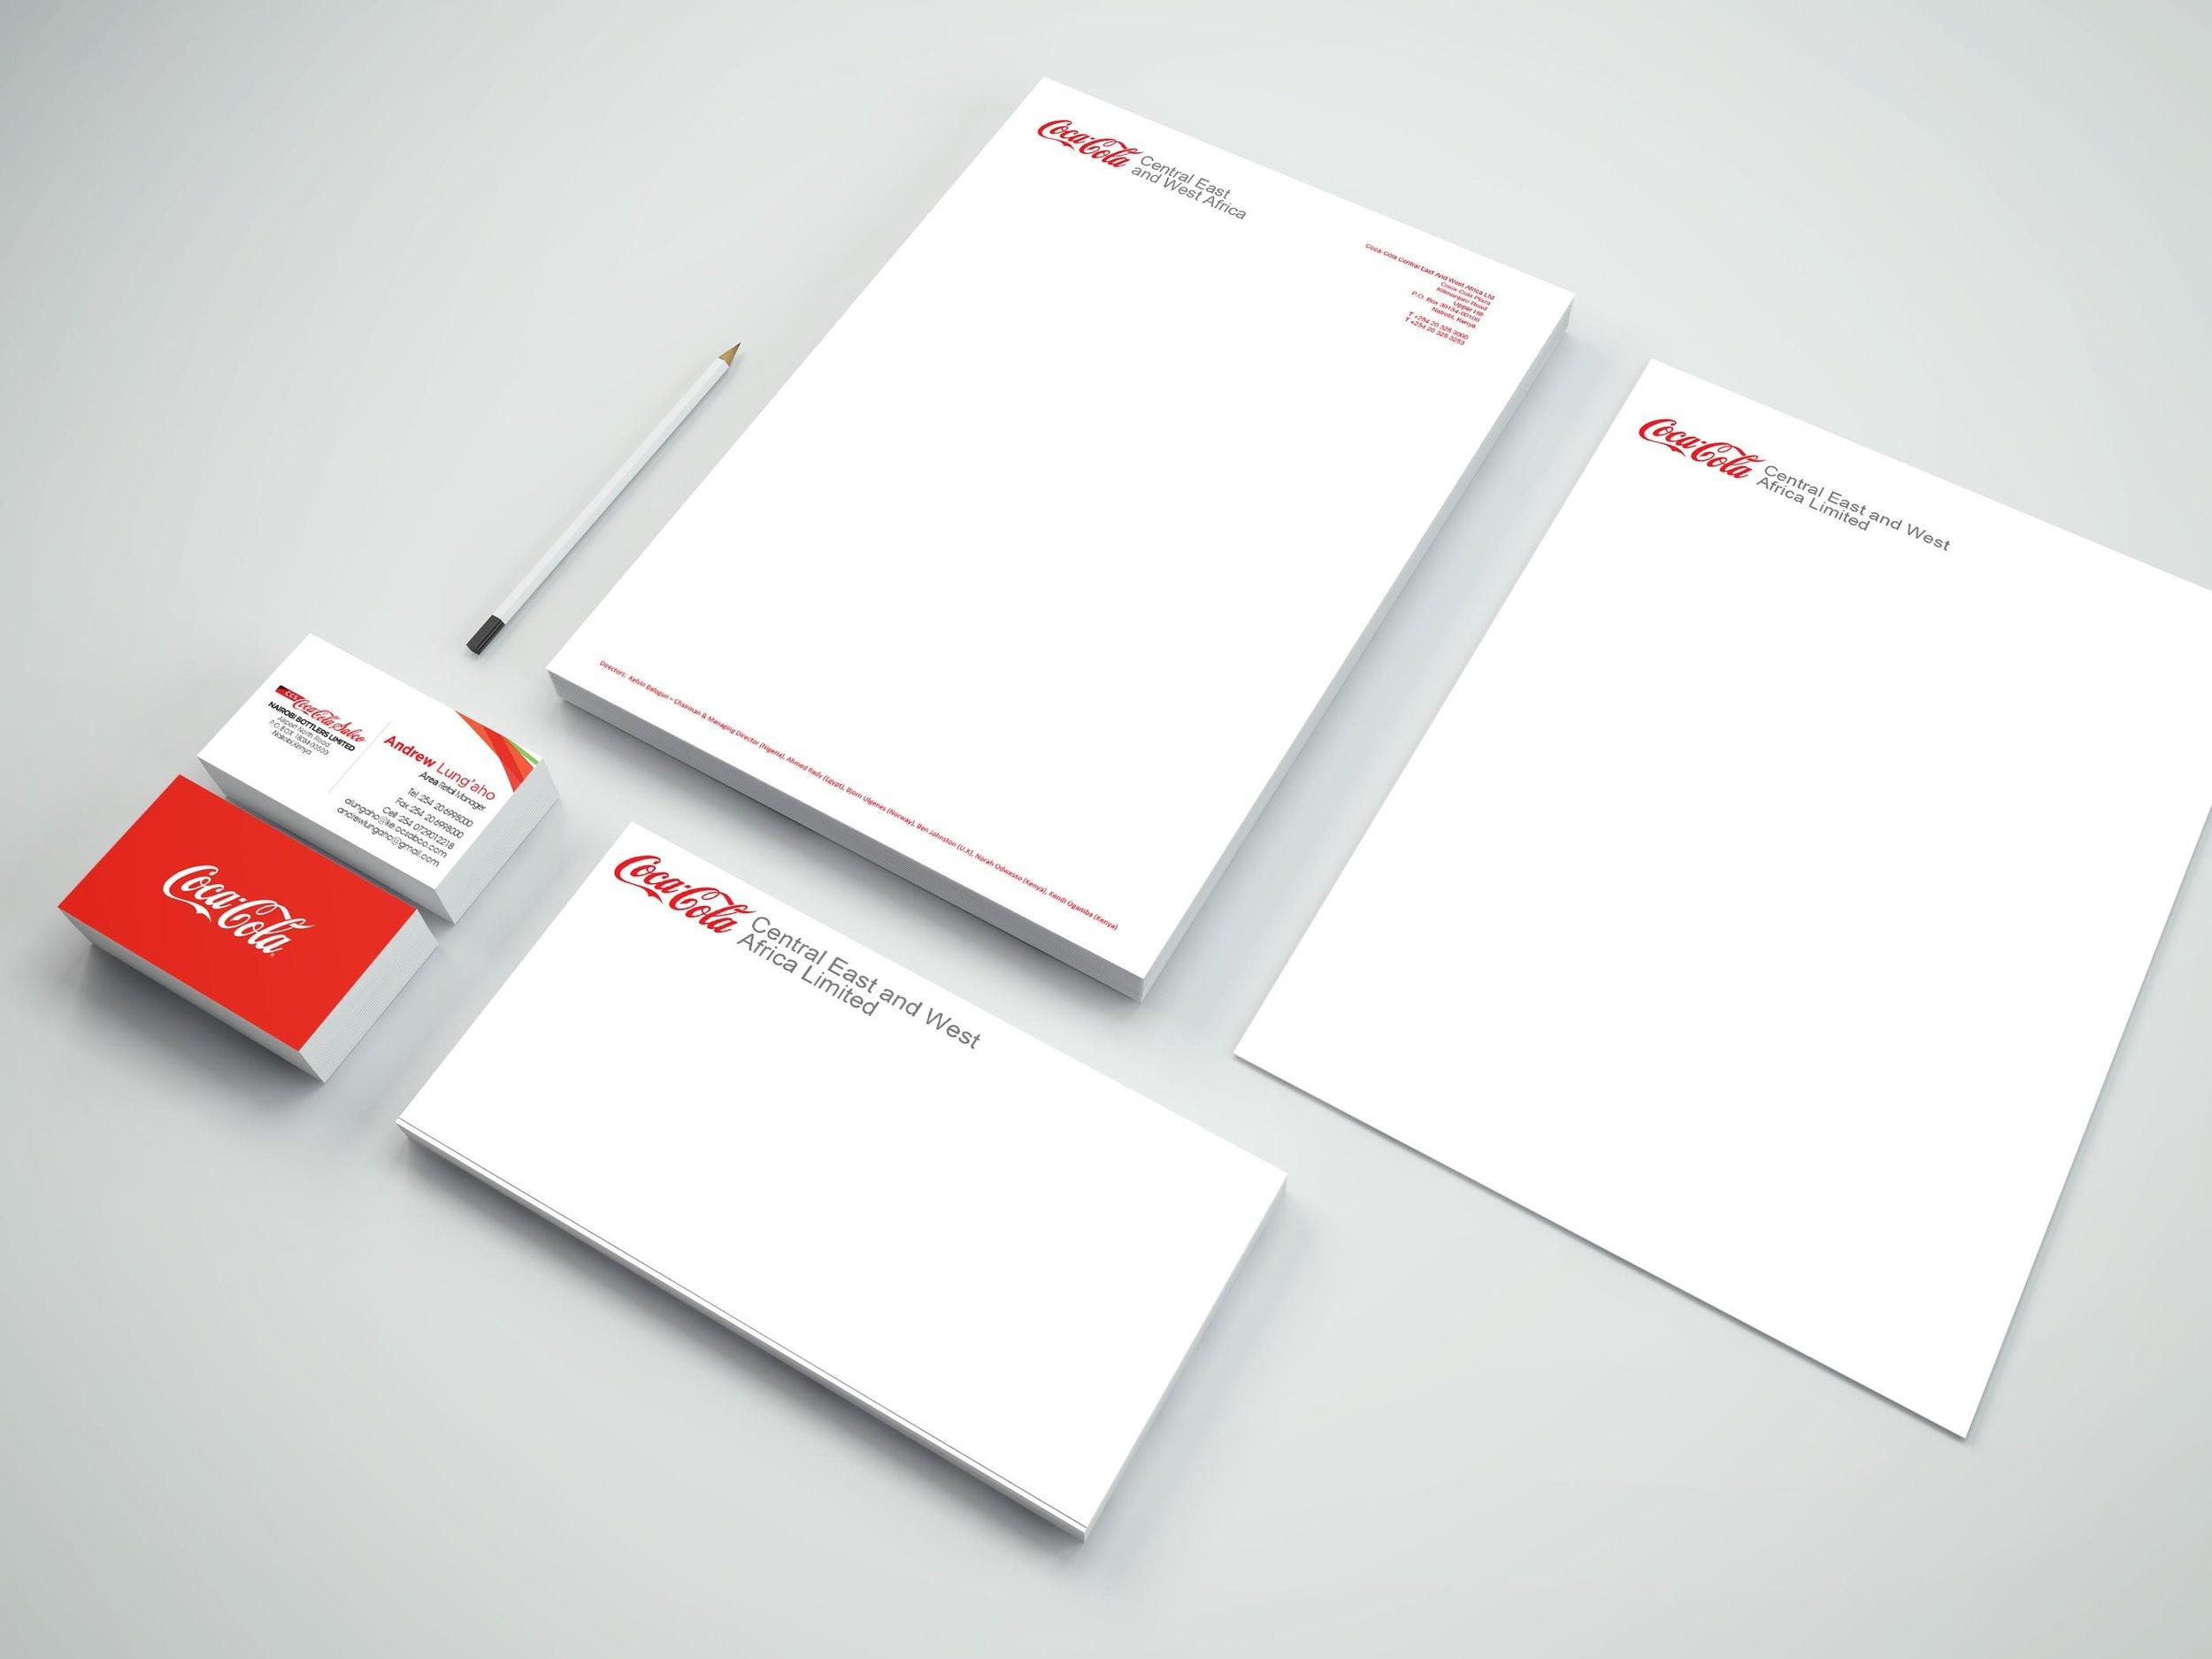 Branding-Stationery Mockup Vol copy.jpg